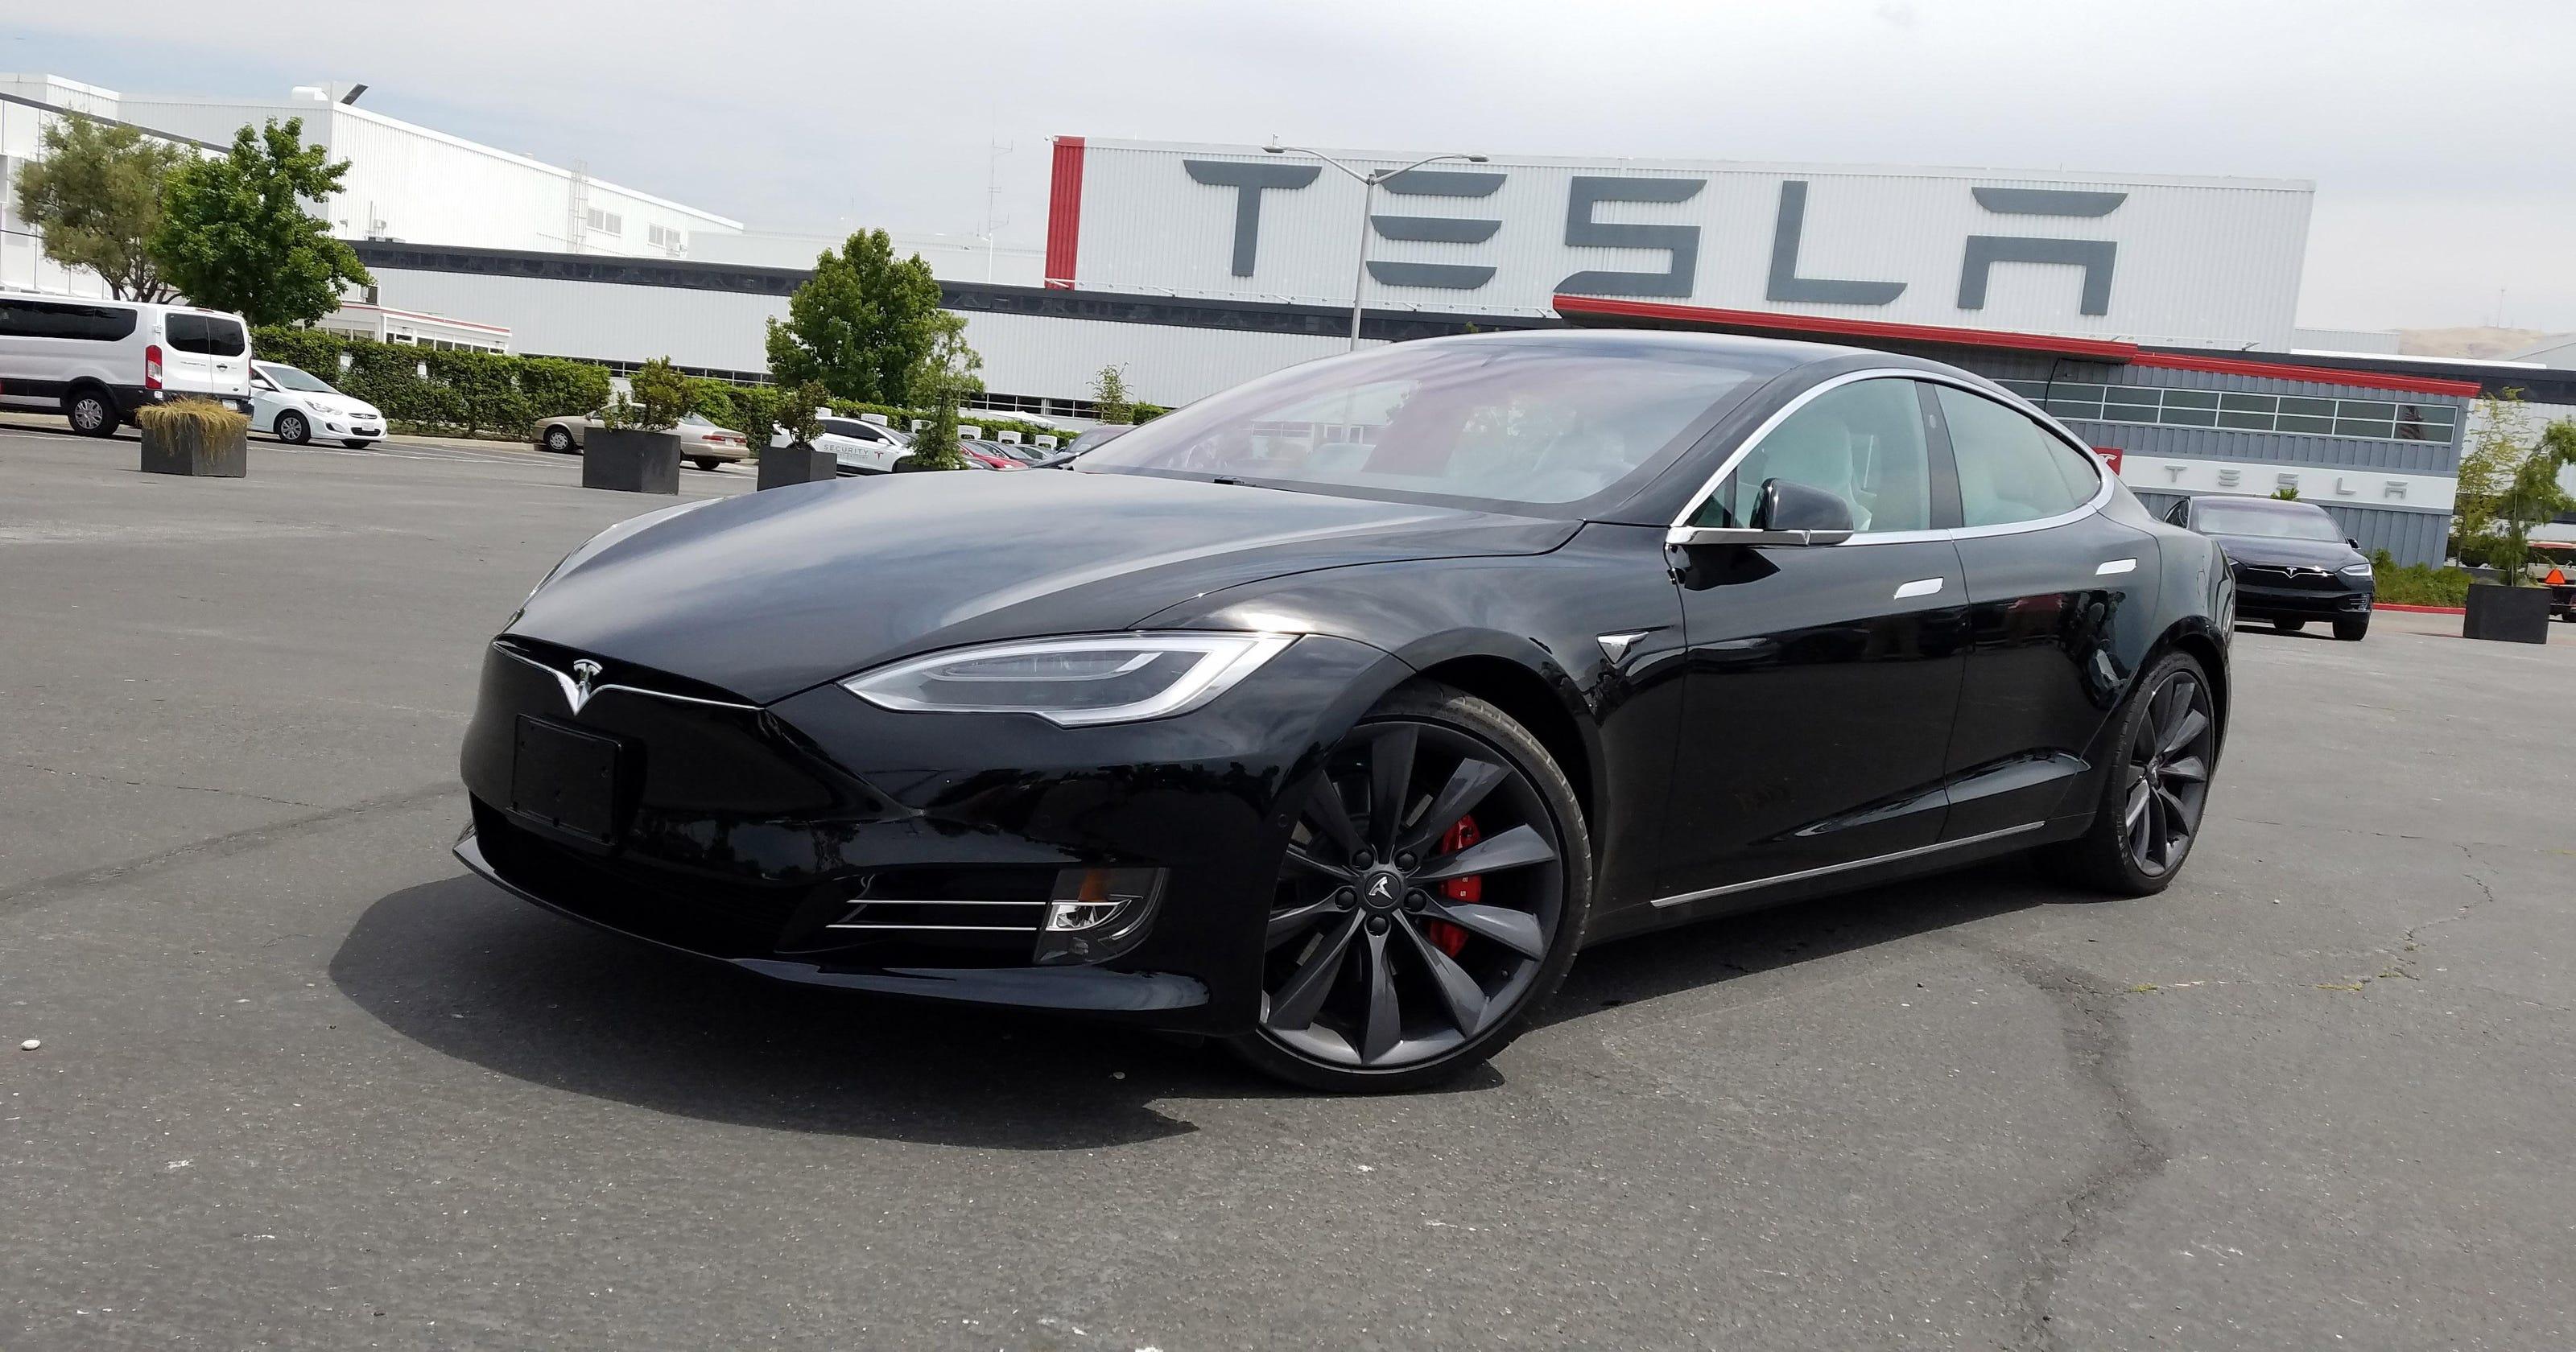 Comparison: Cadillac CT6 vs  Tesla Model S